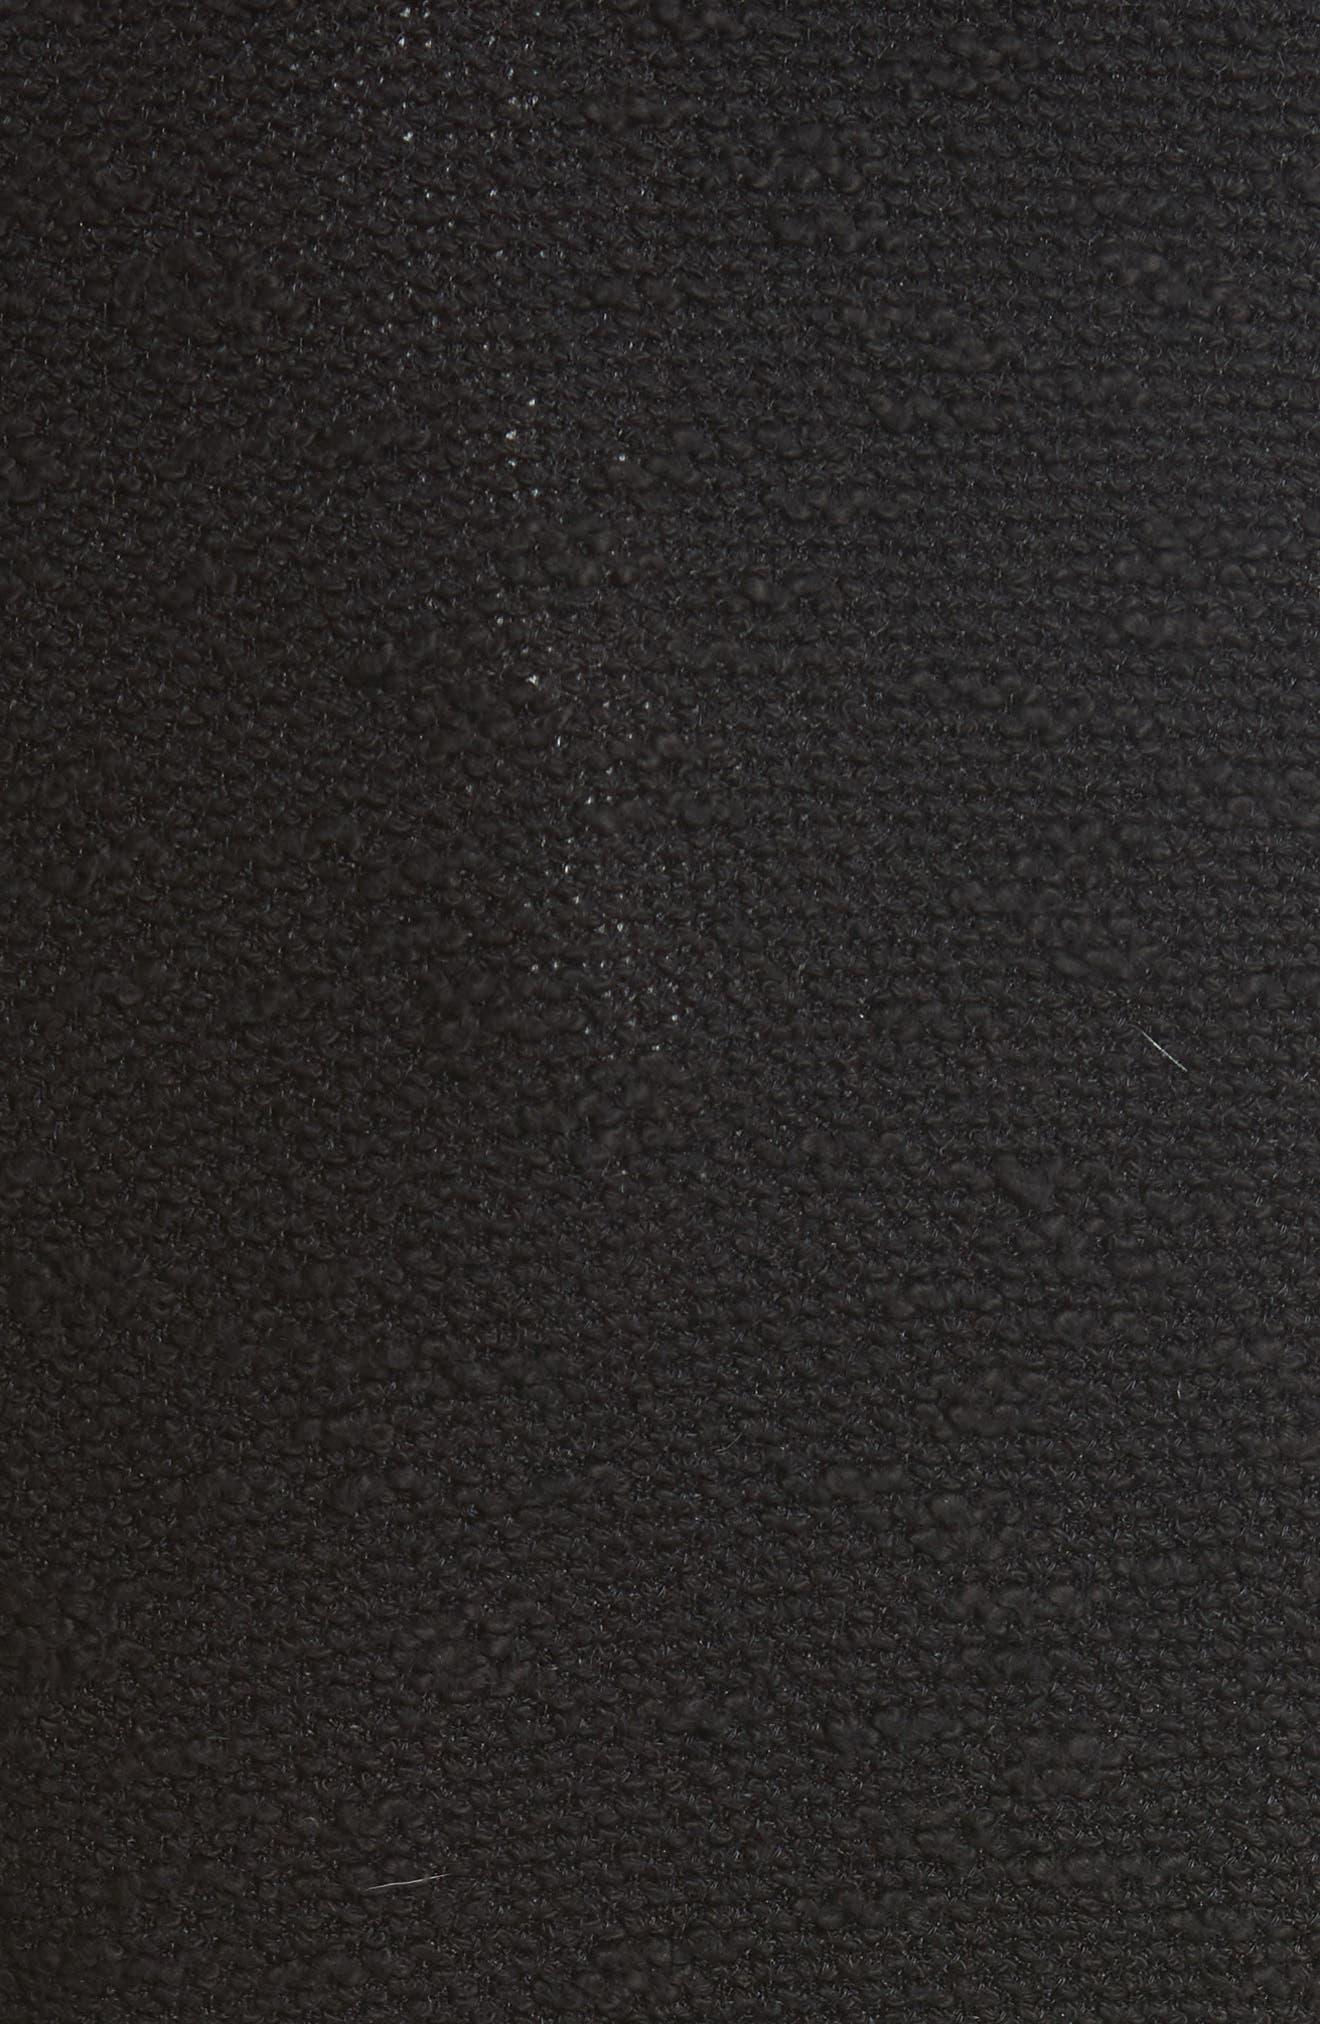 Knit & Lambskin Leather Jacket,                             Alternate thumbnail 5, color,                             Black